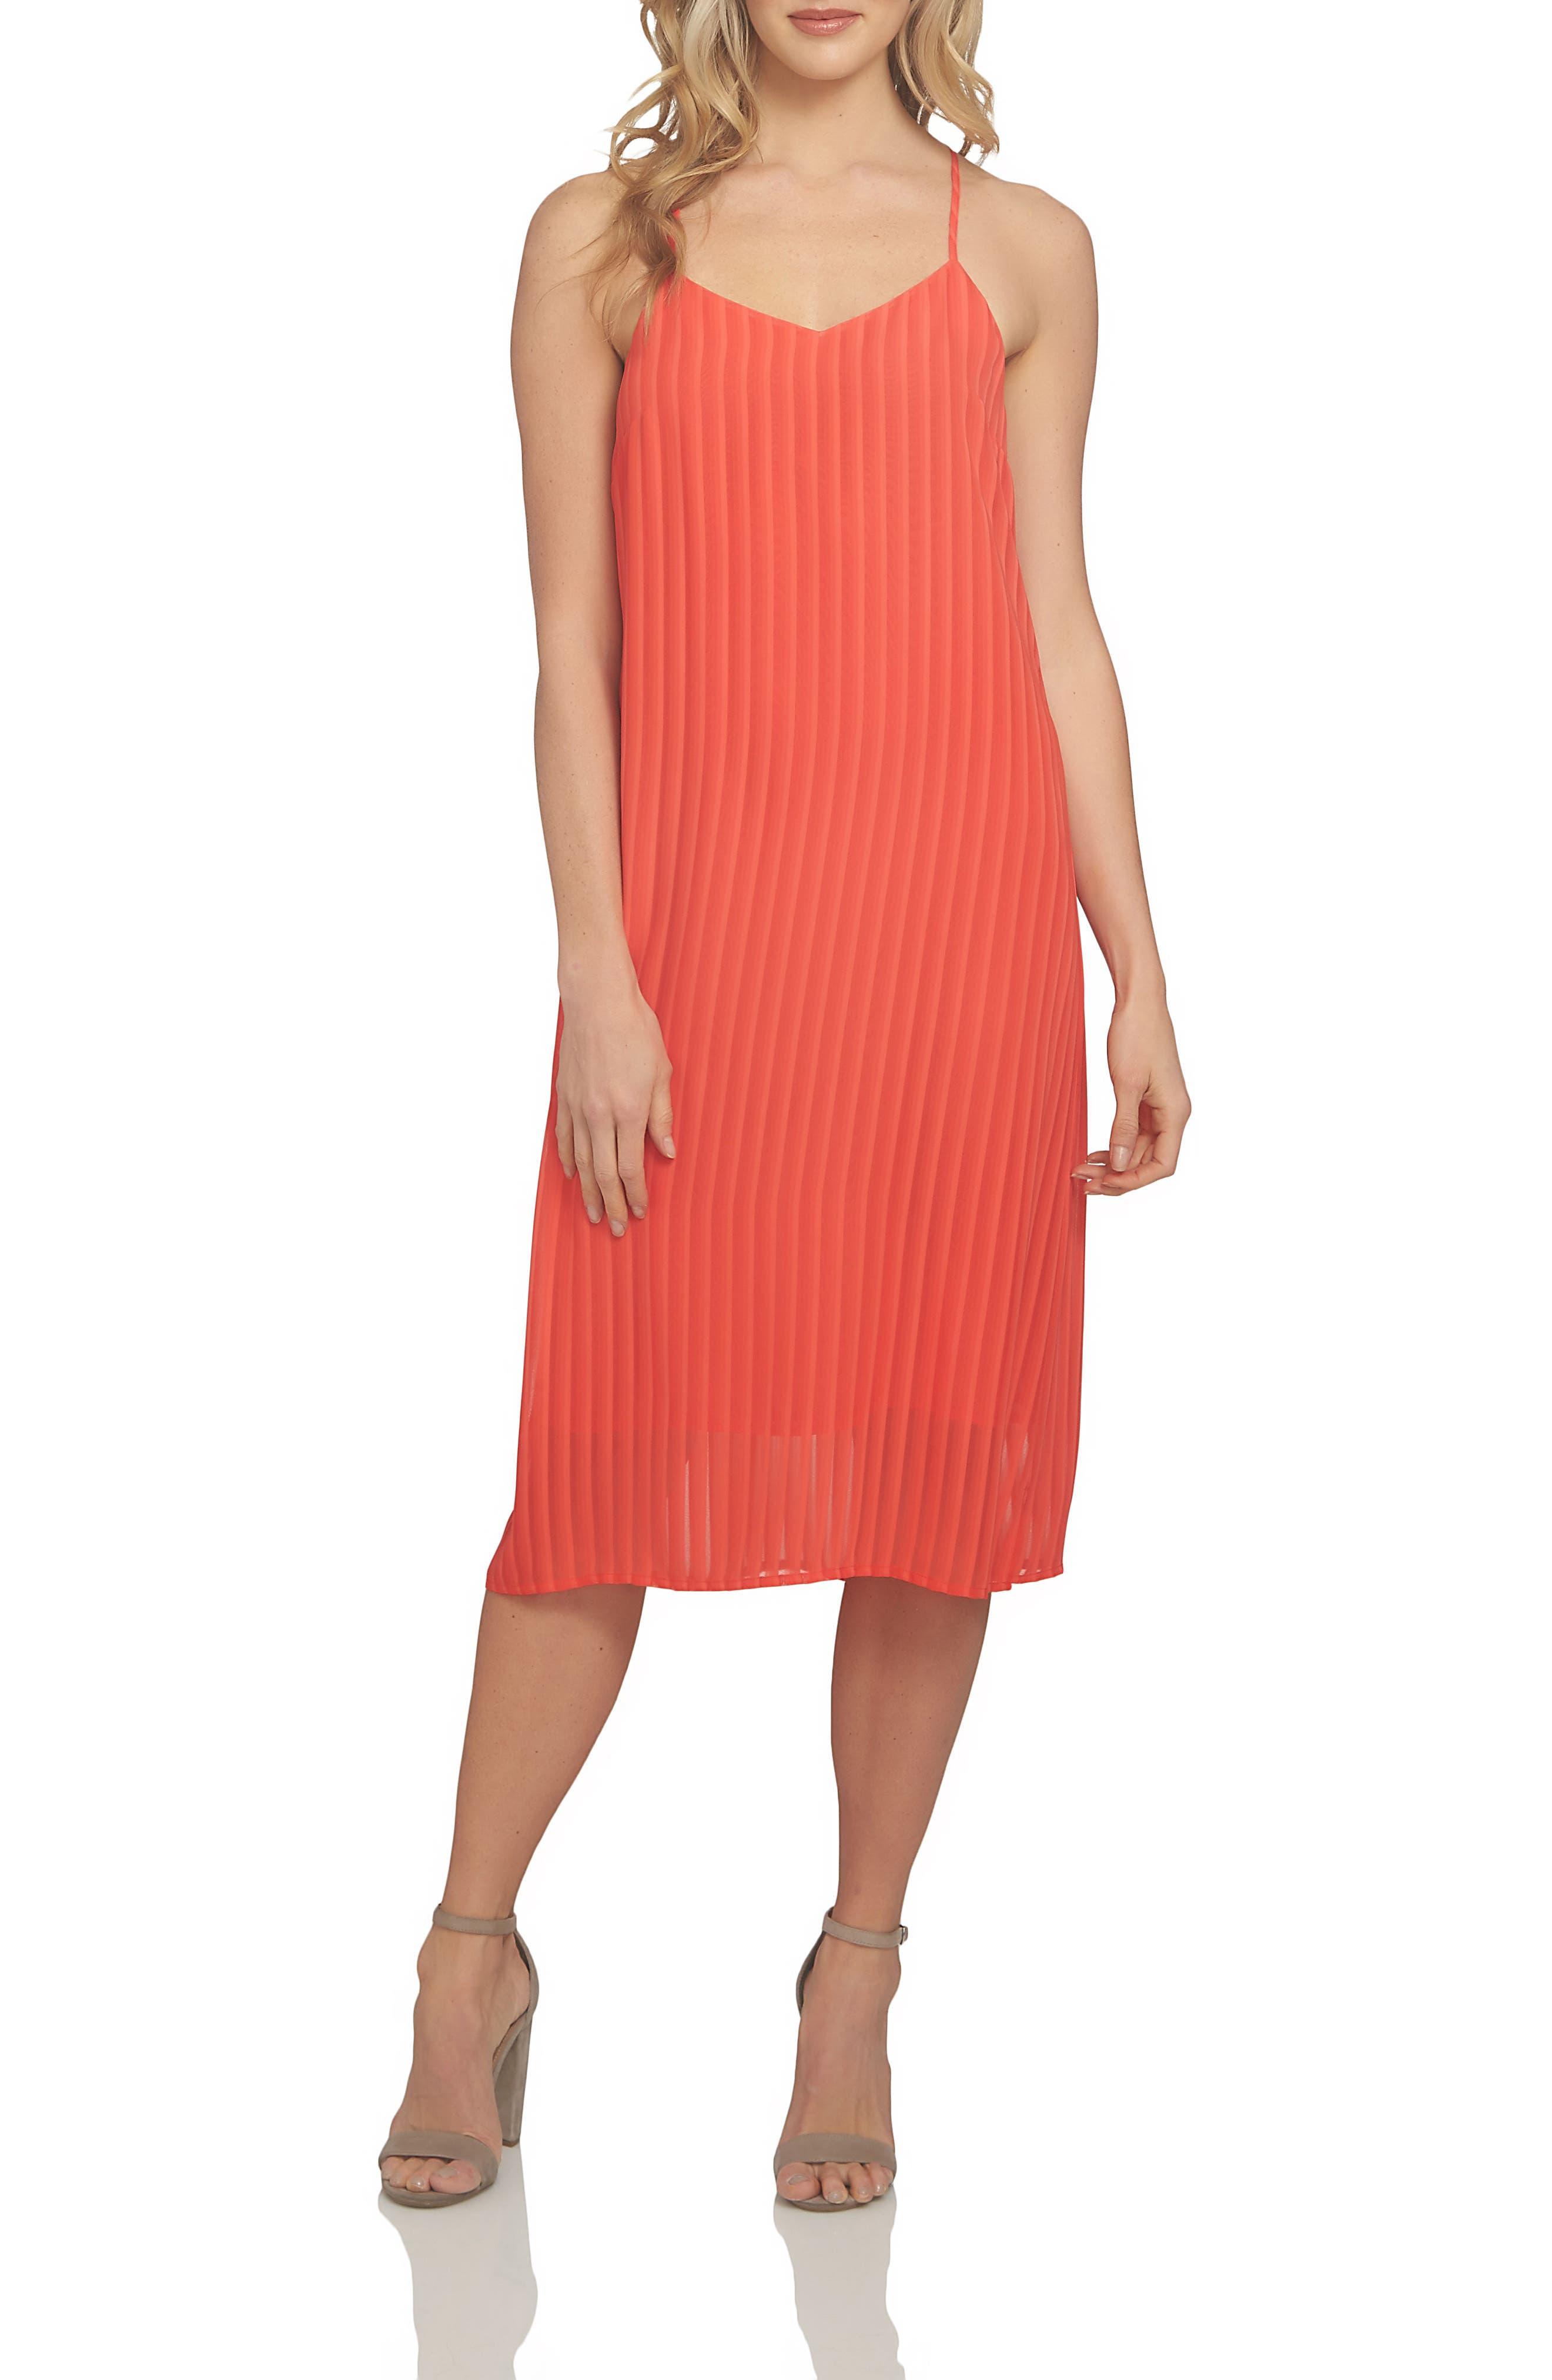 Lacey Chiffon Midi Dress,                             Alternate thumbnail 3, color,                             609